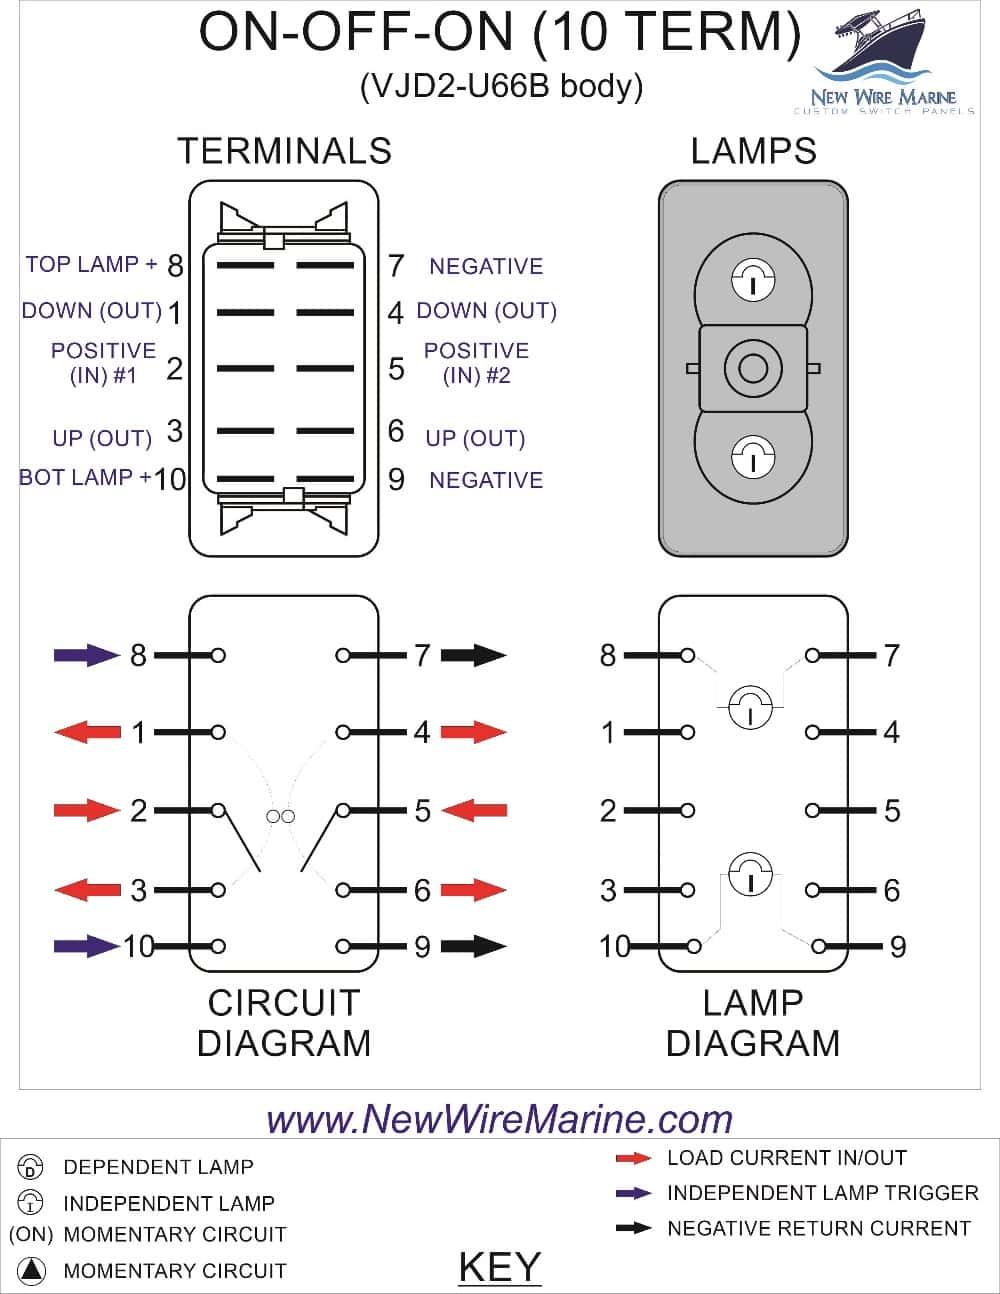 Rocker Switch Wiring Diagrams | New Wire Marine - 3 Pin Rocker Switch Wiring Diagram